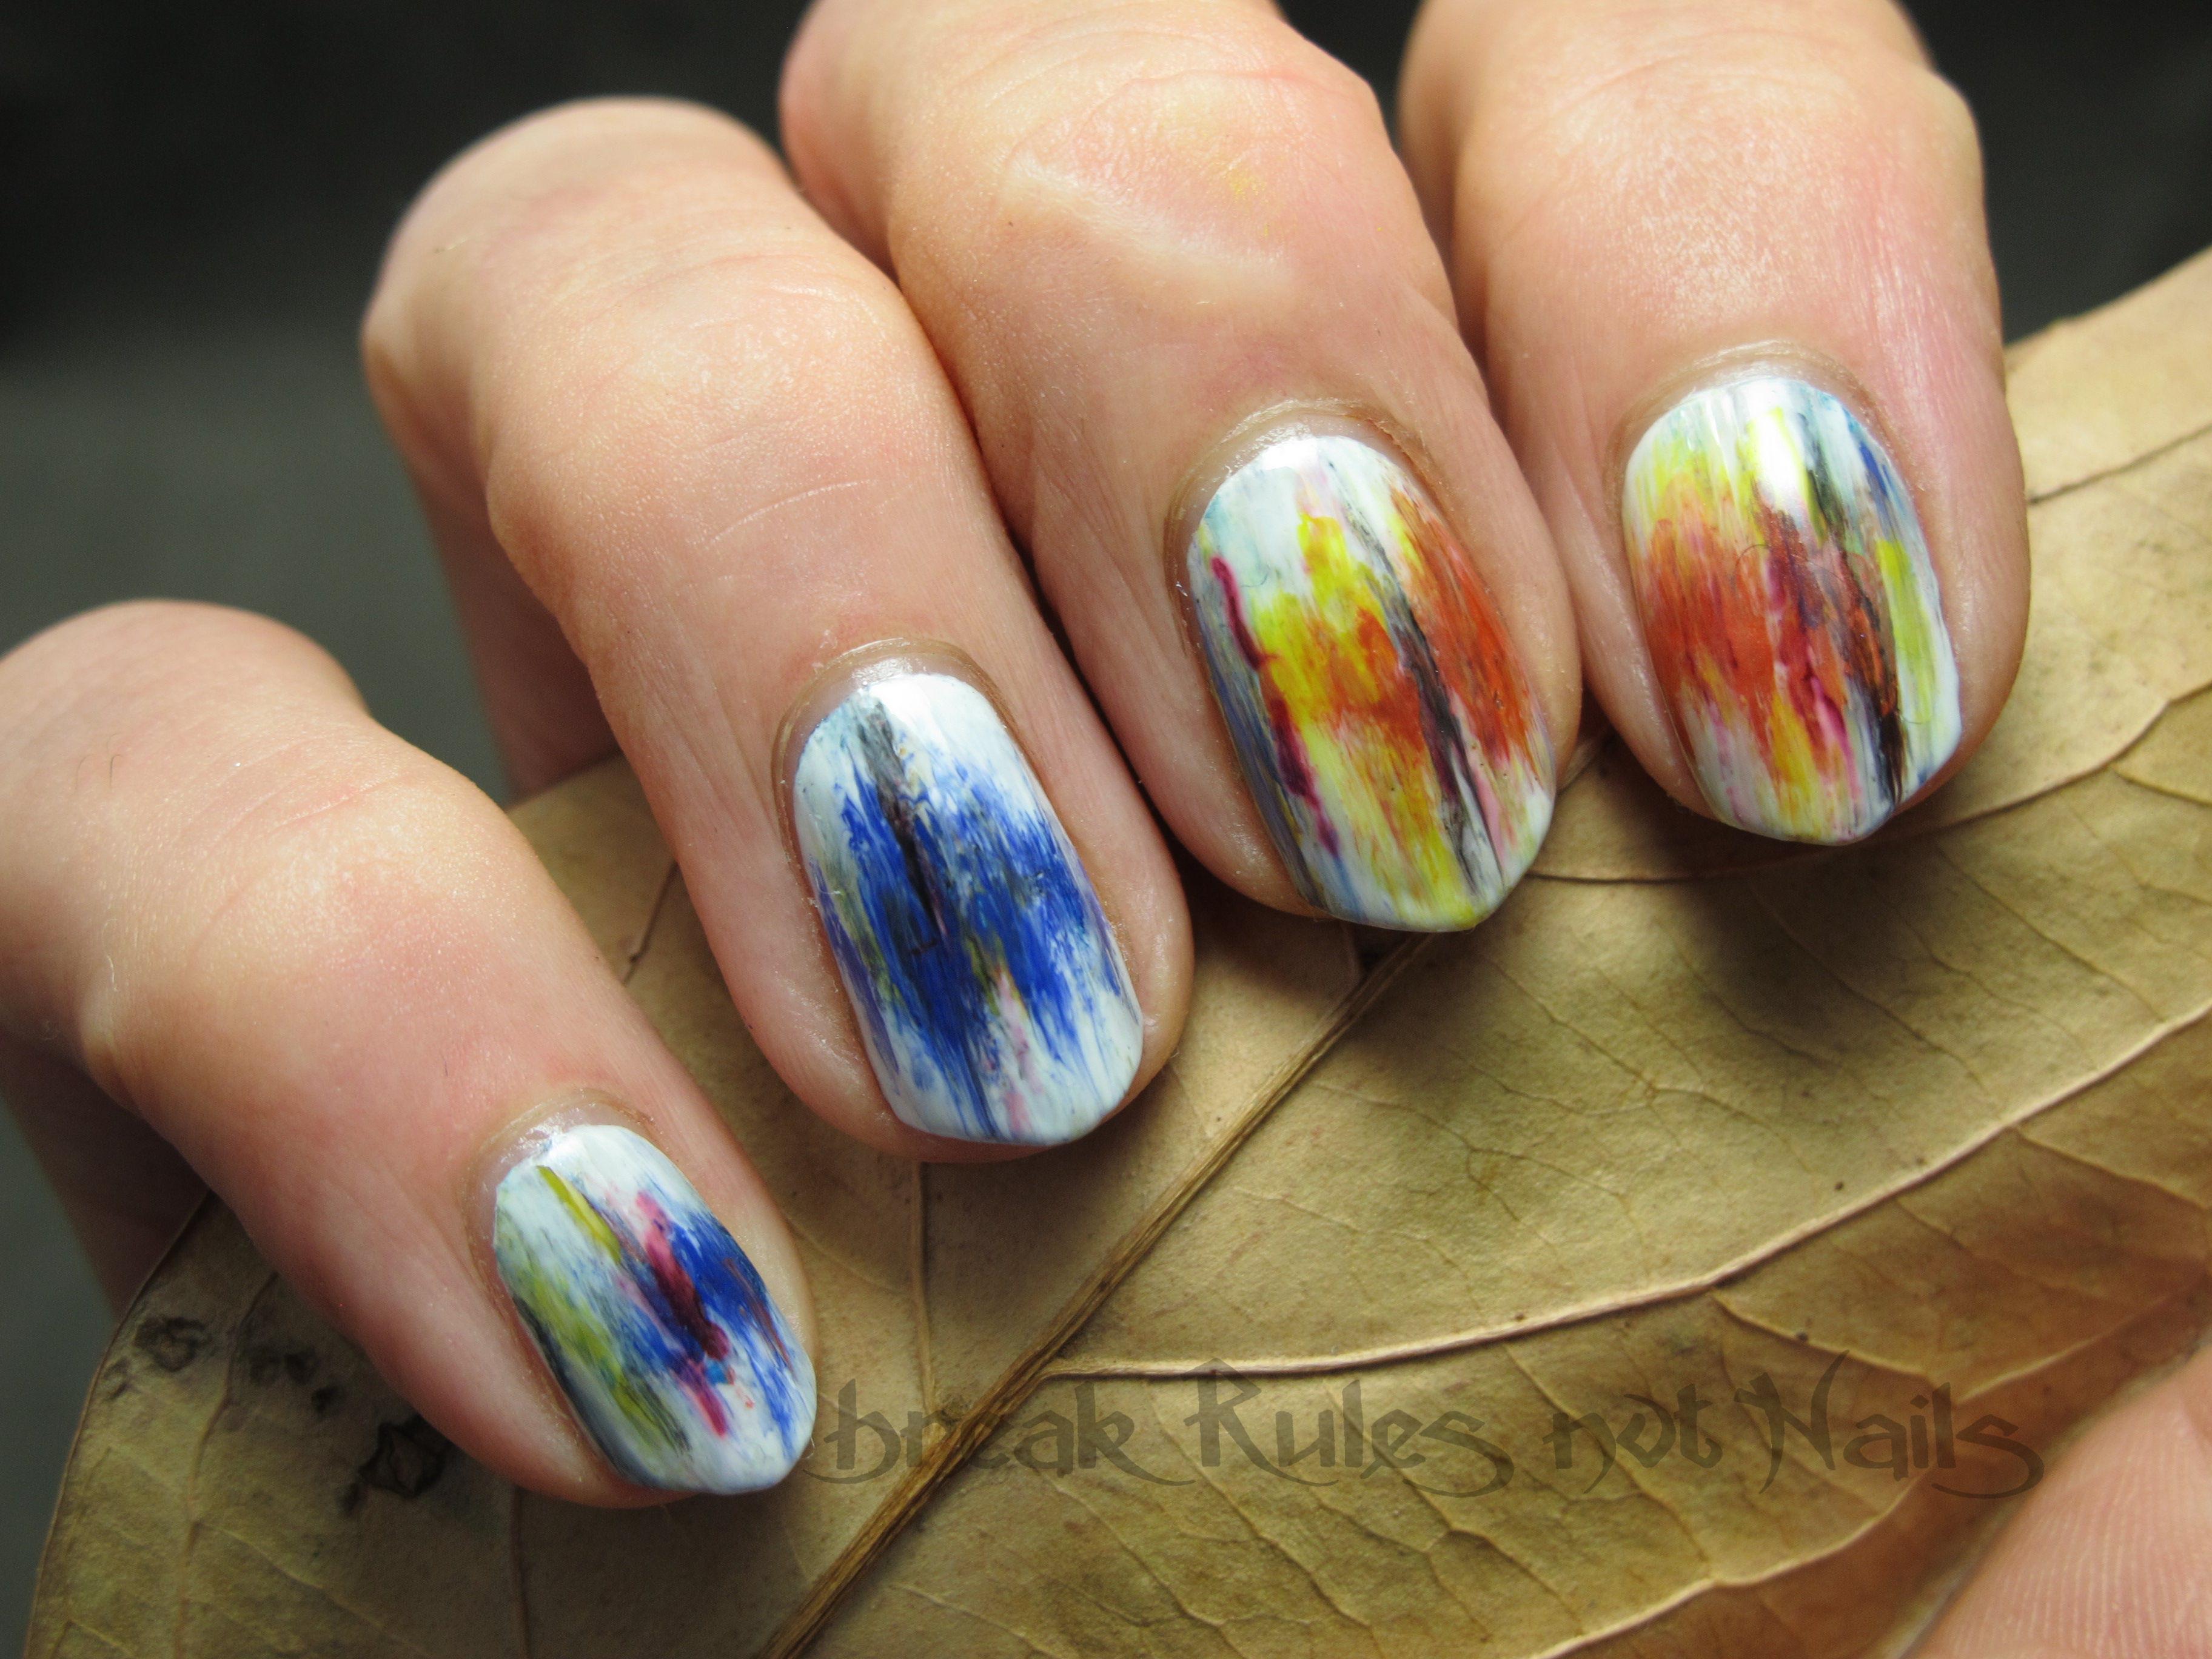 textured nail art | Break rules, not nails